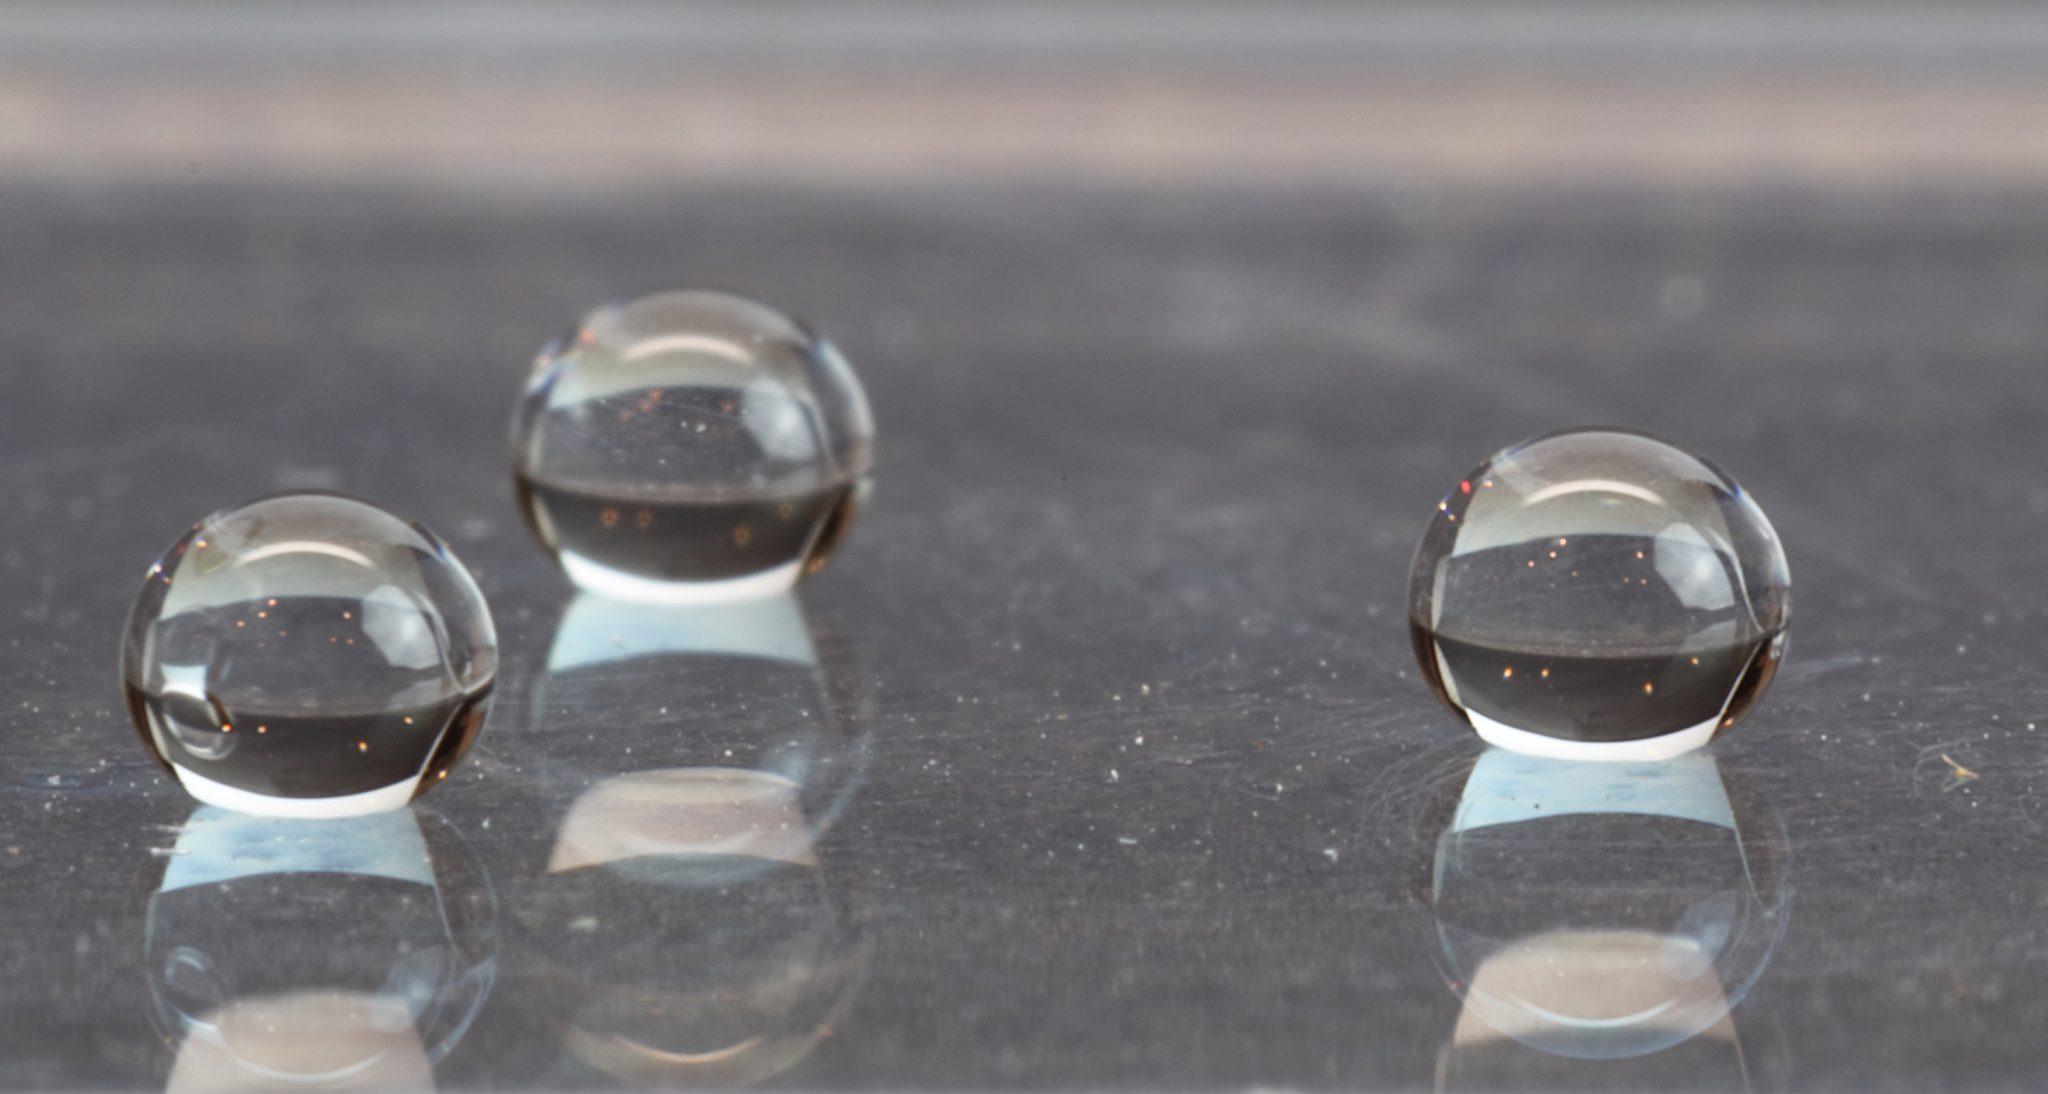 AeroPel icephobic coating water droplets